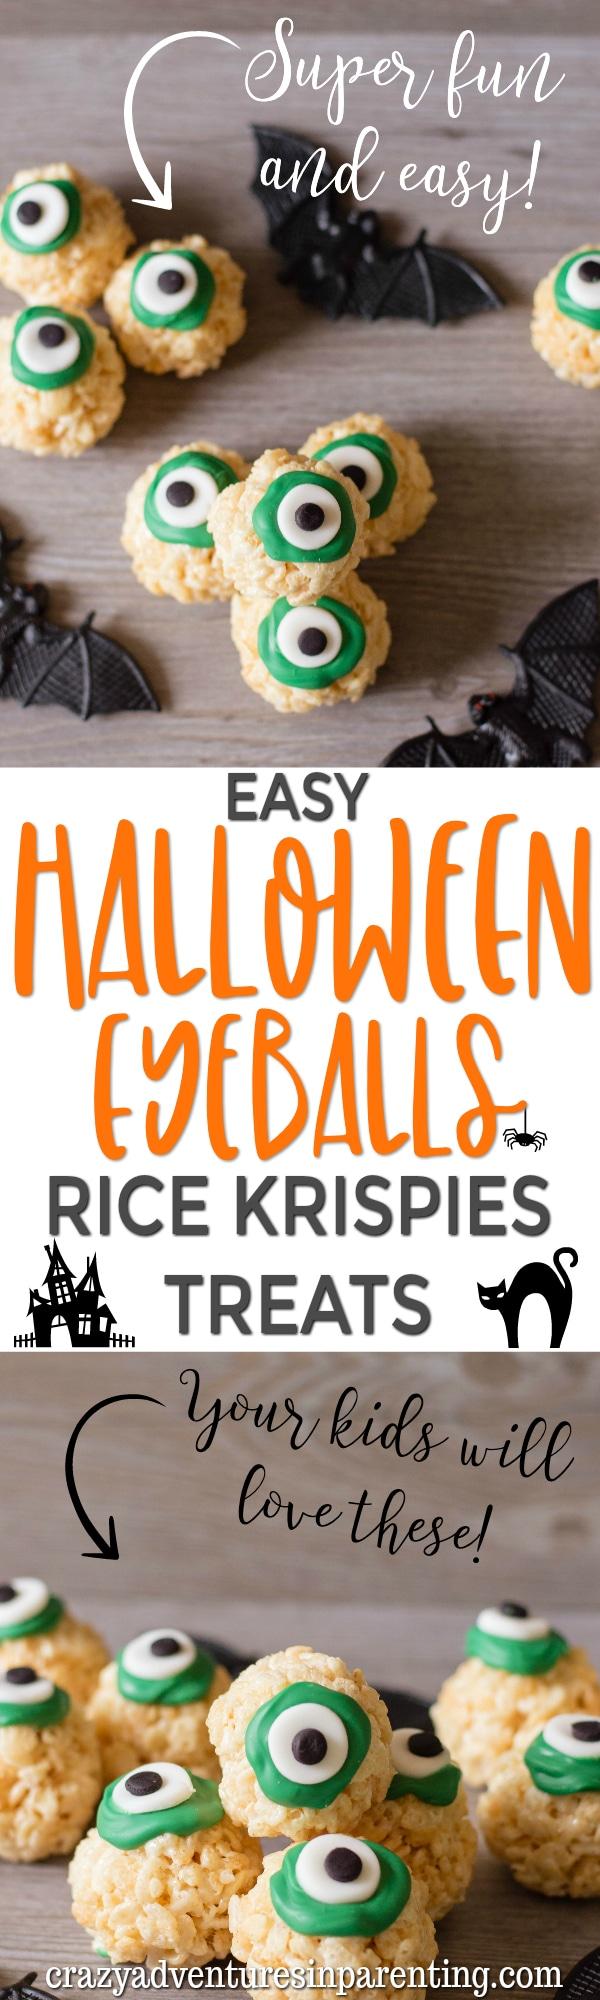 Easy Halloween Eyeballs Rice Krispies Treats Recipe